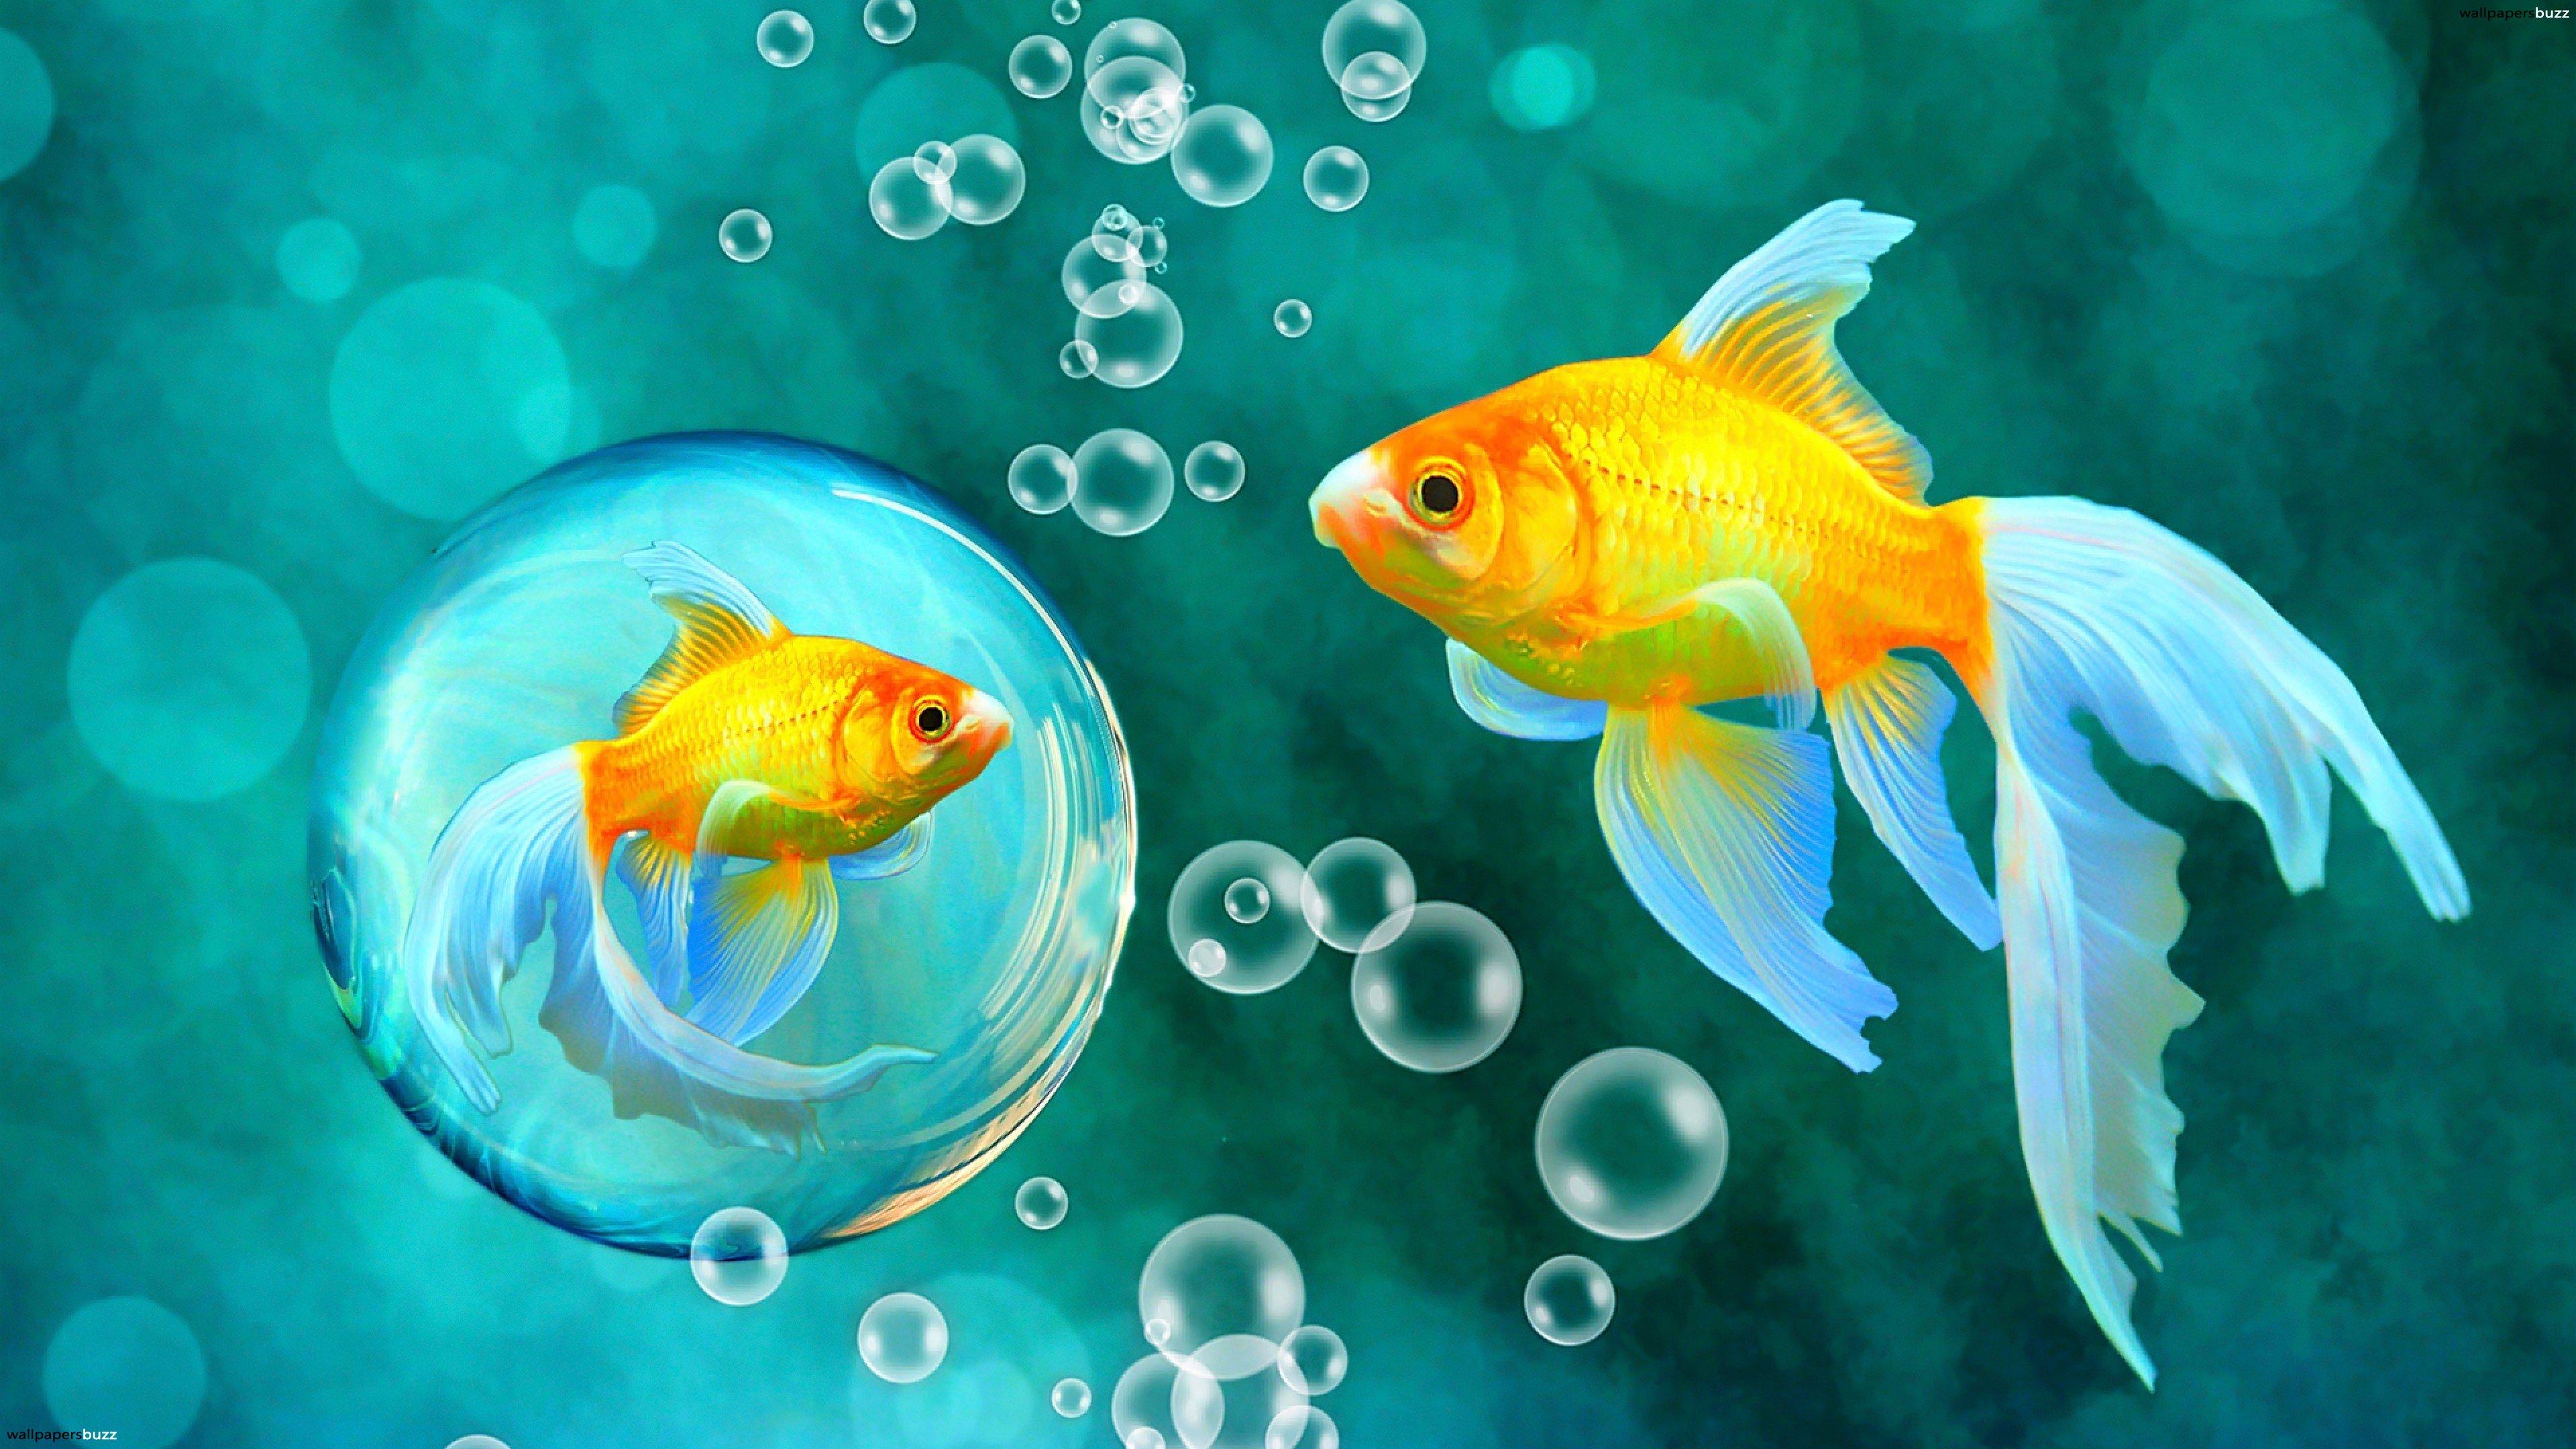 Drawn goldfish fish swimming Wallpaper in are You HD